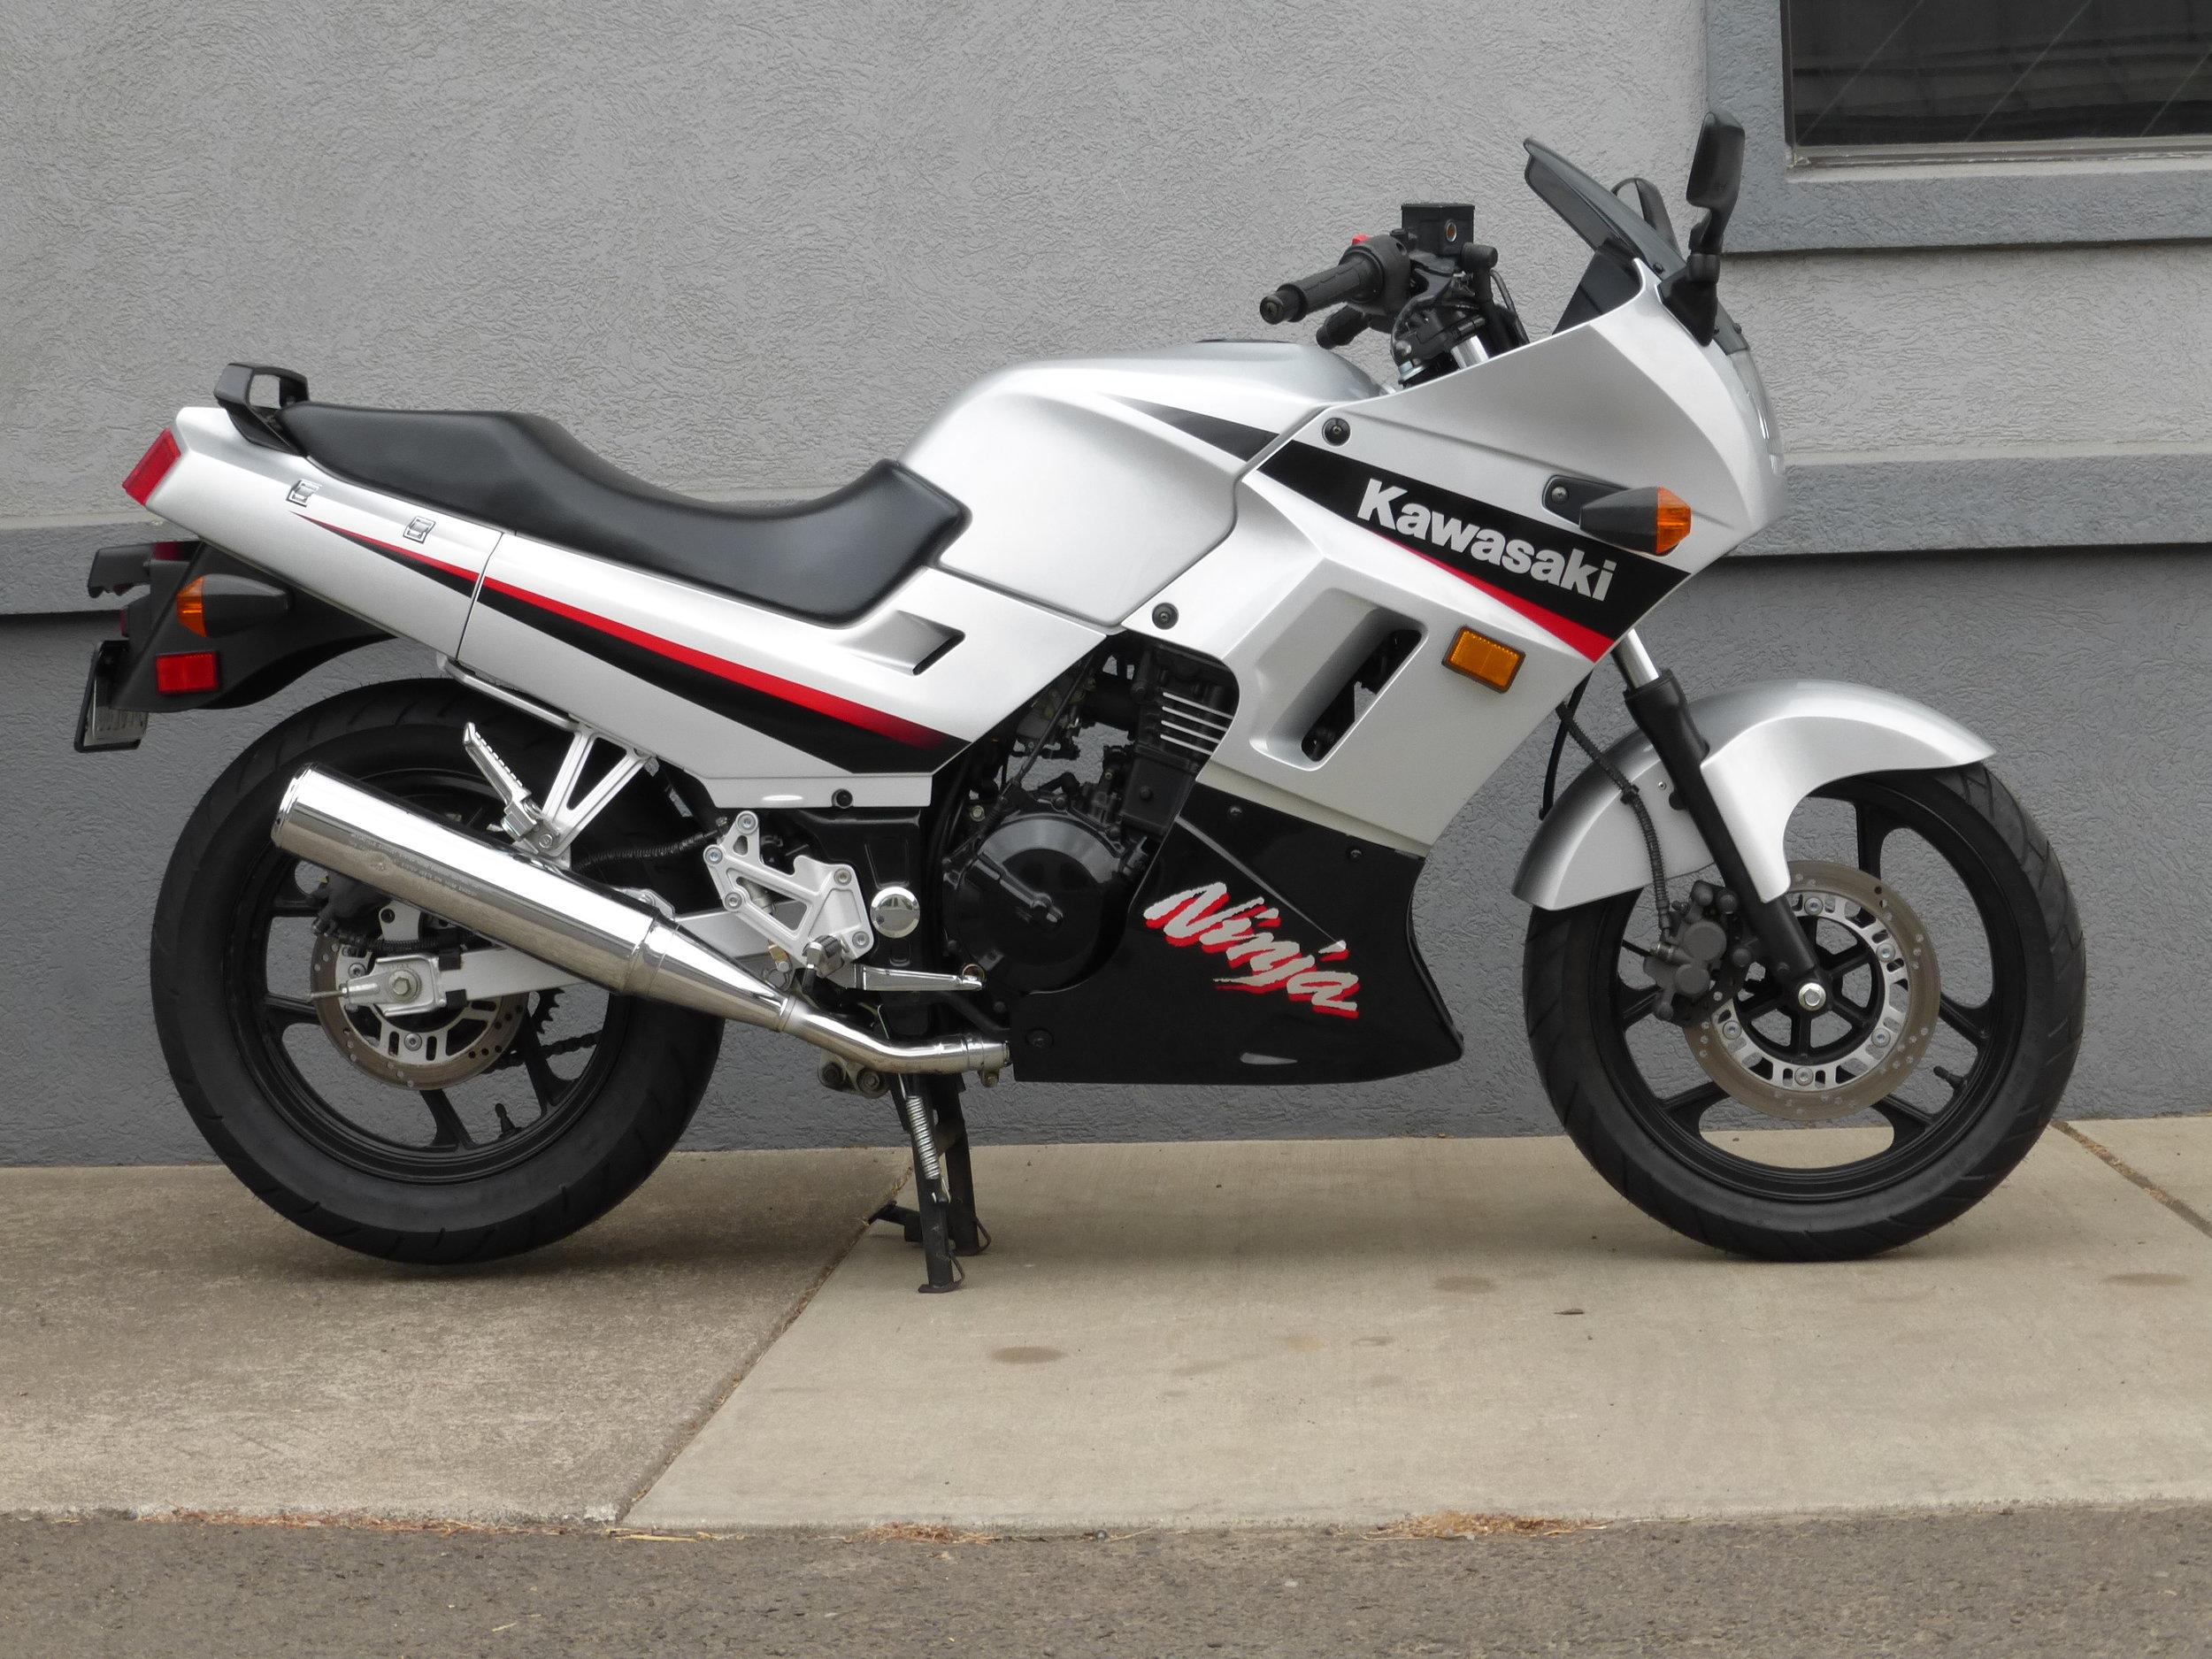 2005 Kawasaki Ninja Ex250 Excellent Low Miles Bikes Toms Cycle